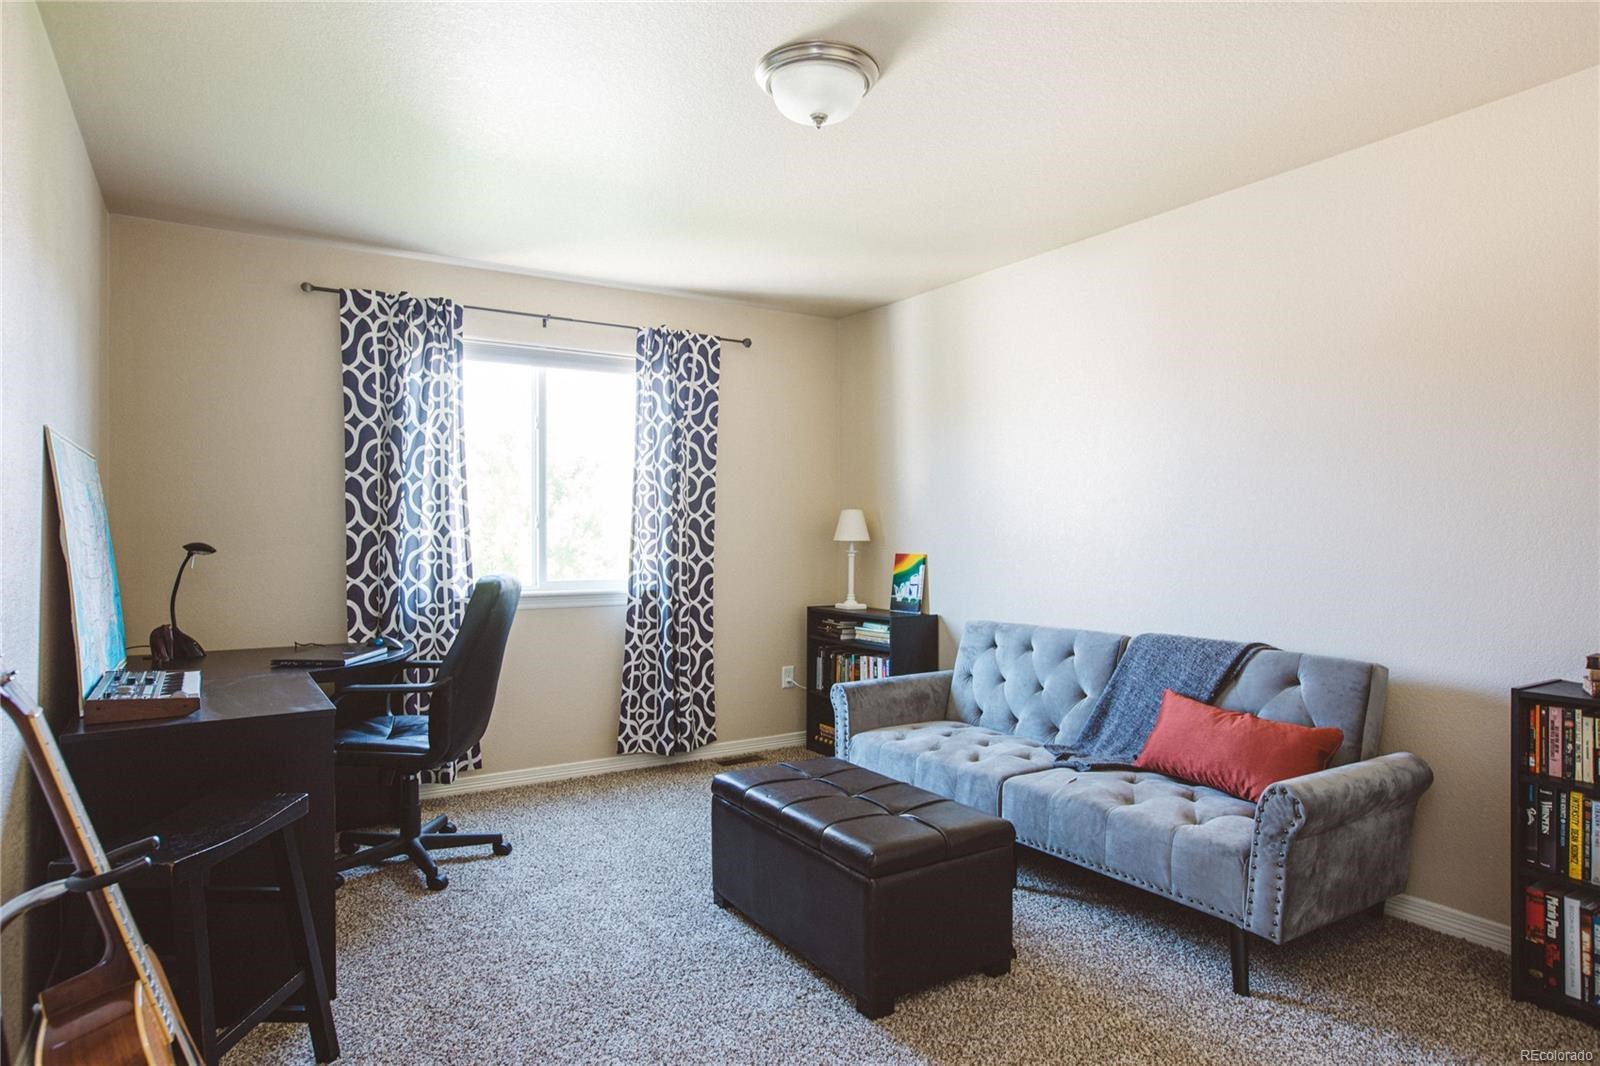 MLS# 3958717 - 24 - 591 Dakota Court, Windsor, CO 80550